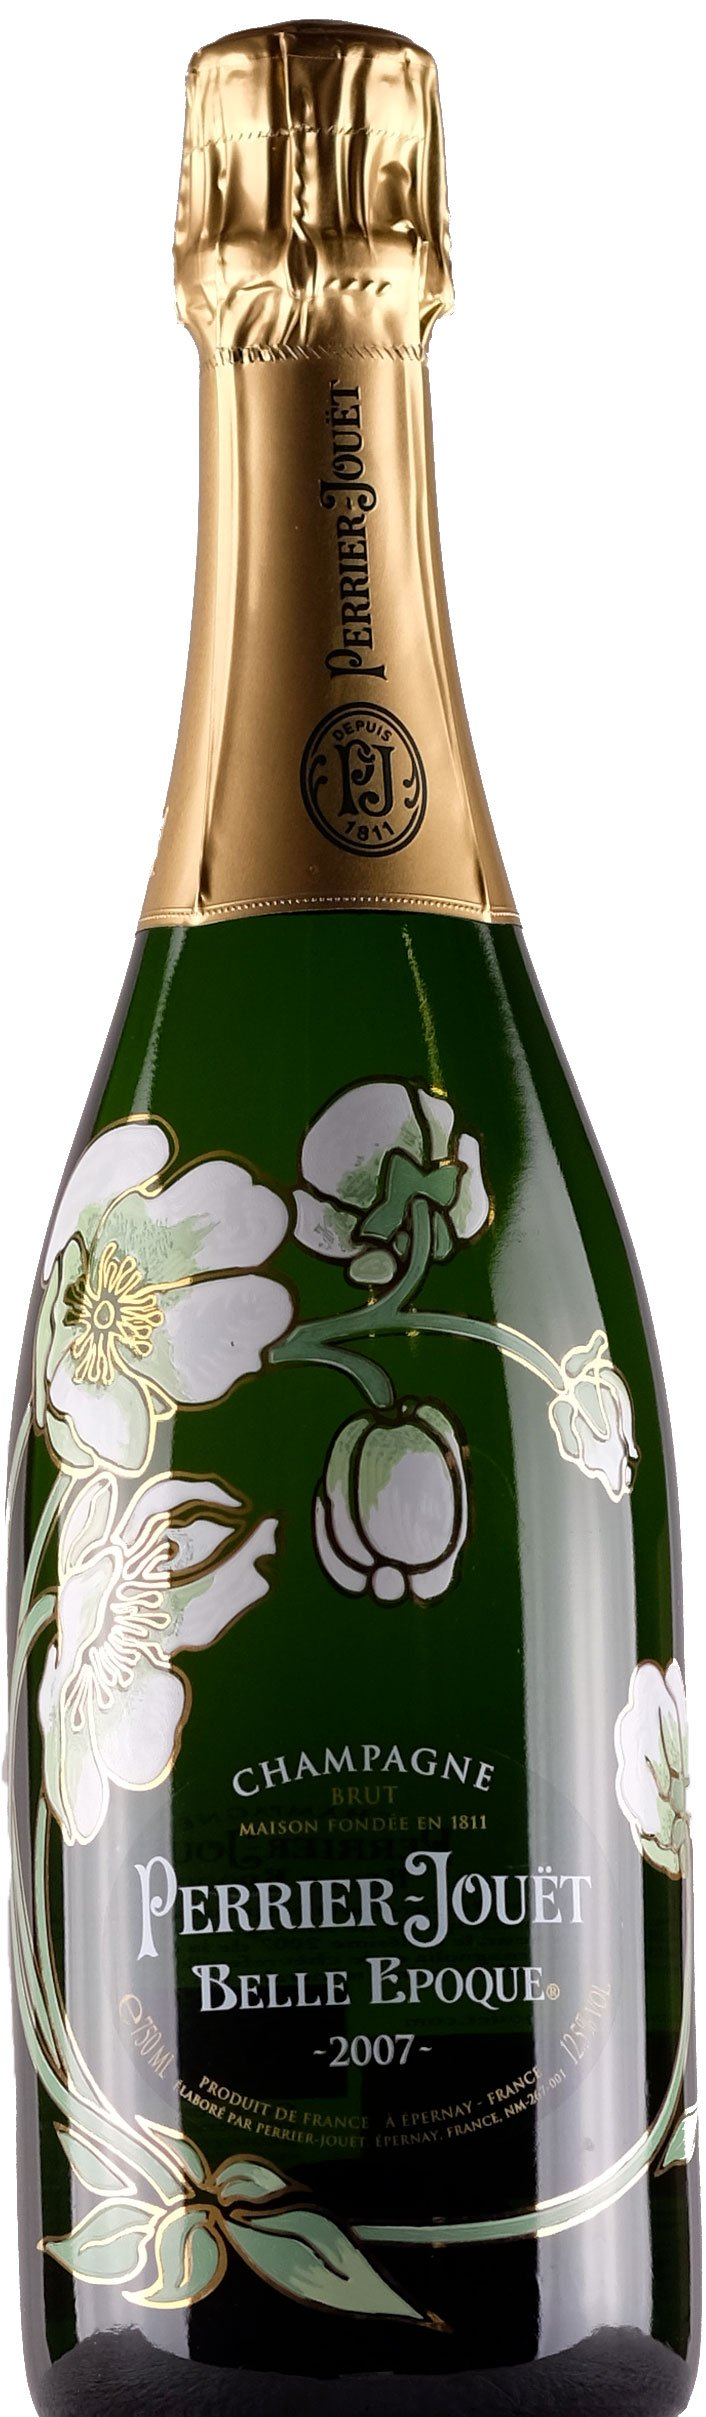 Perrier-Jouet-Champagne-Belle-Epoque-2007